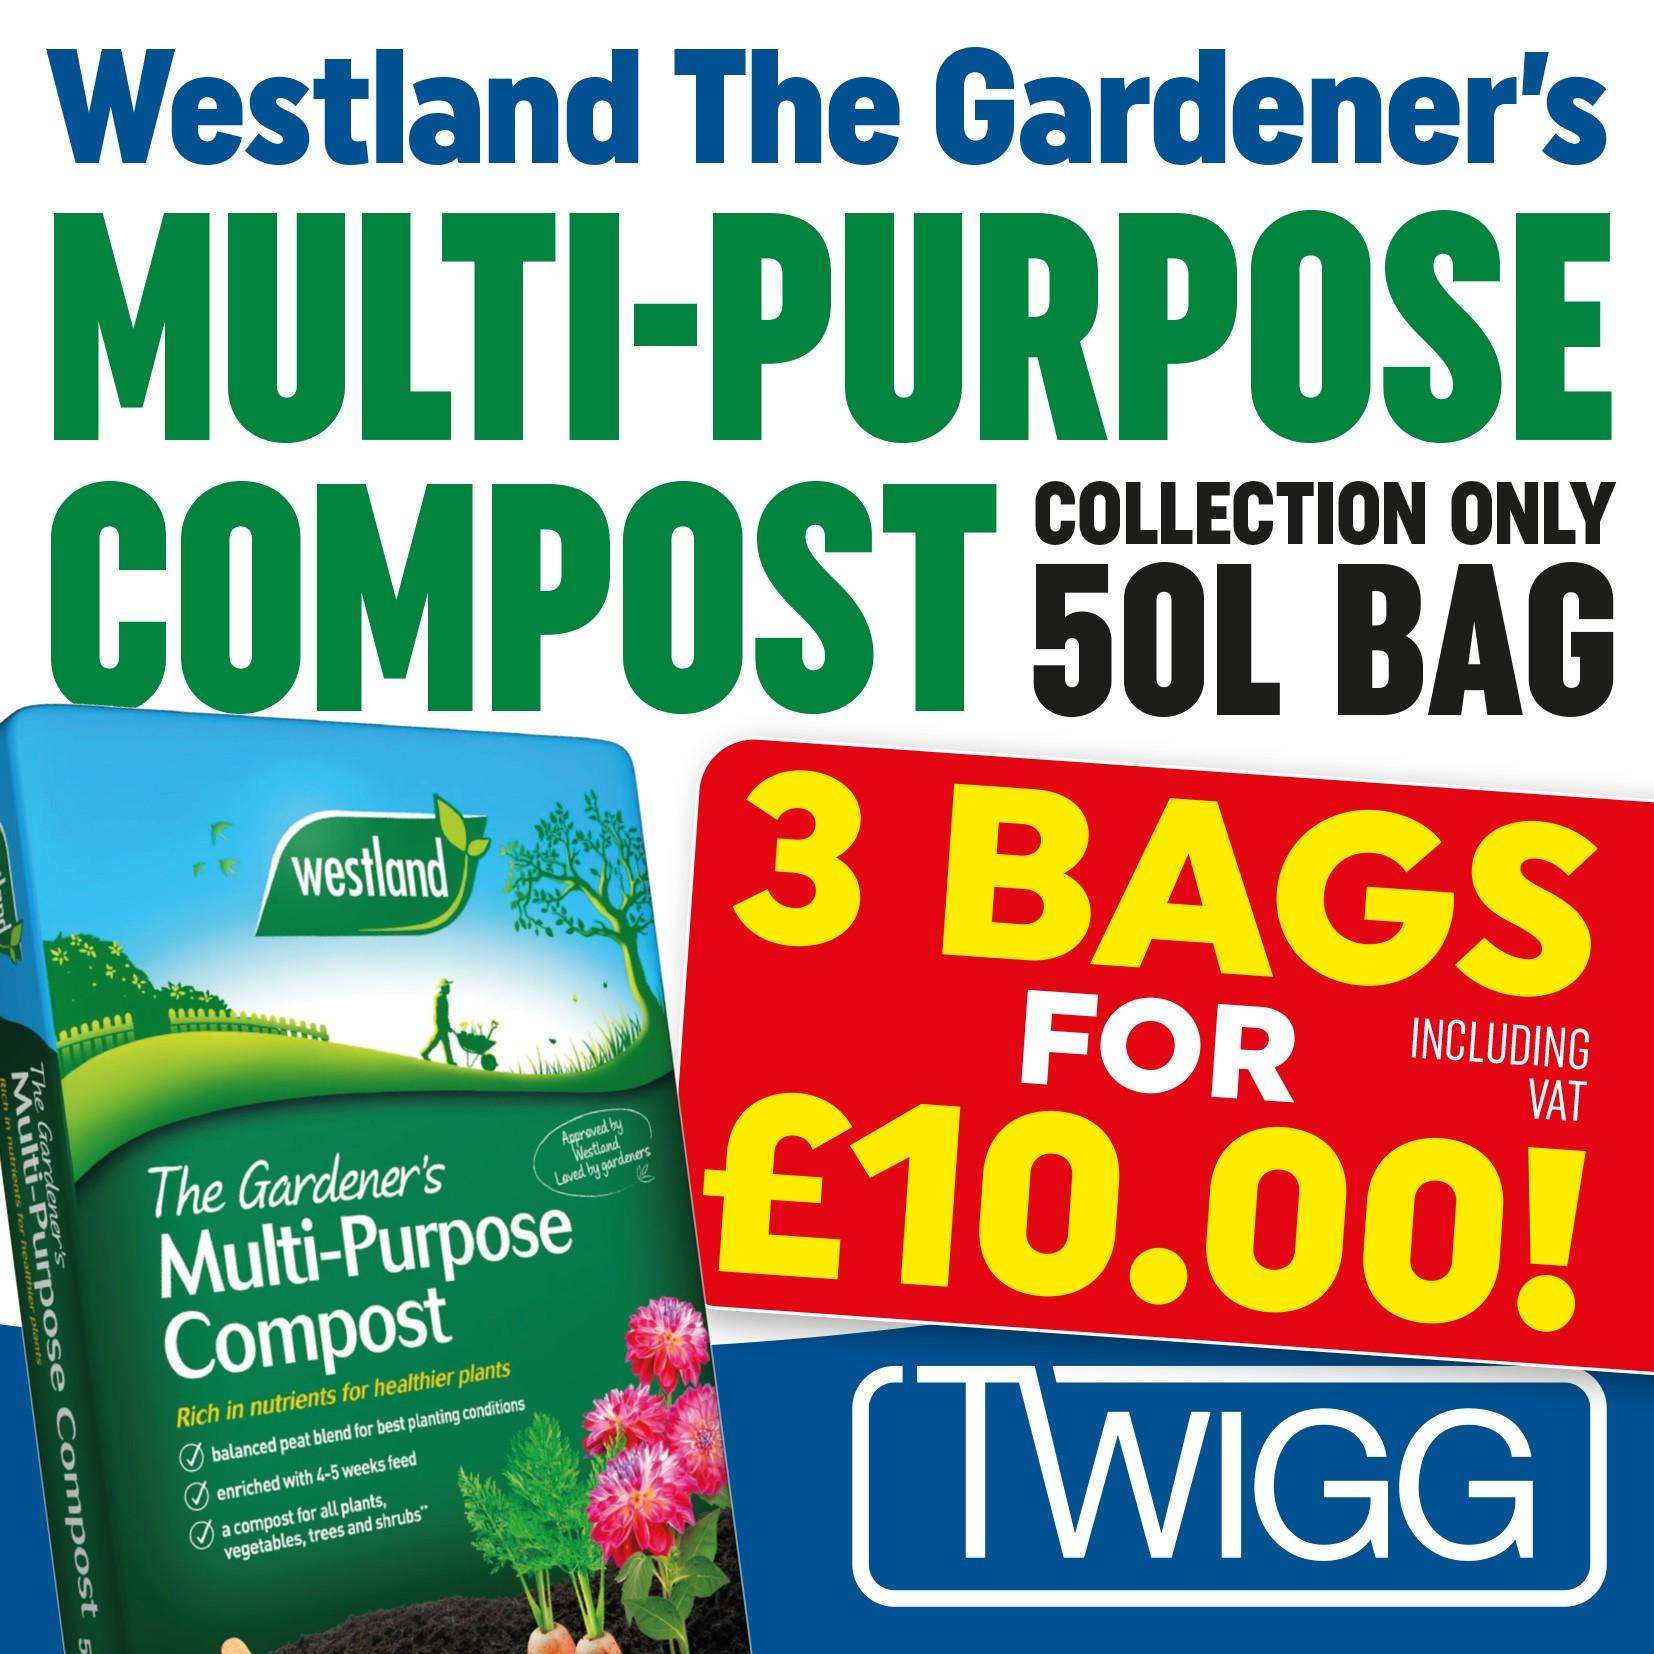 WESTLAND 50 LITRE COMPOST - 3 BAGS FOR £10 INC VAT WHILST STOCKS LAST